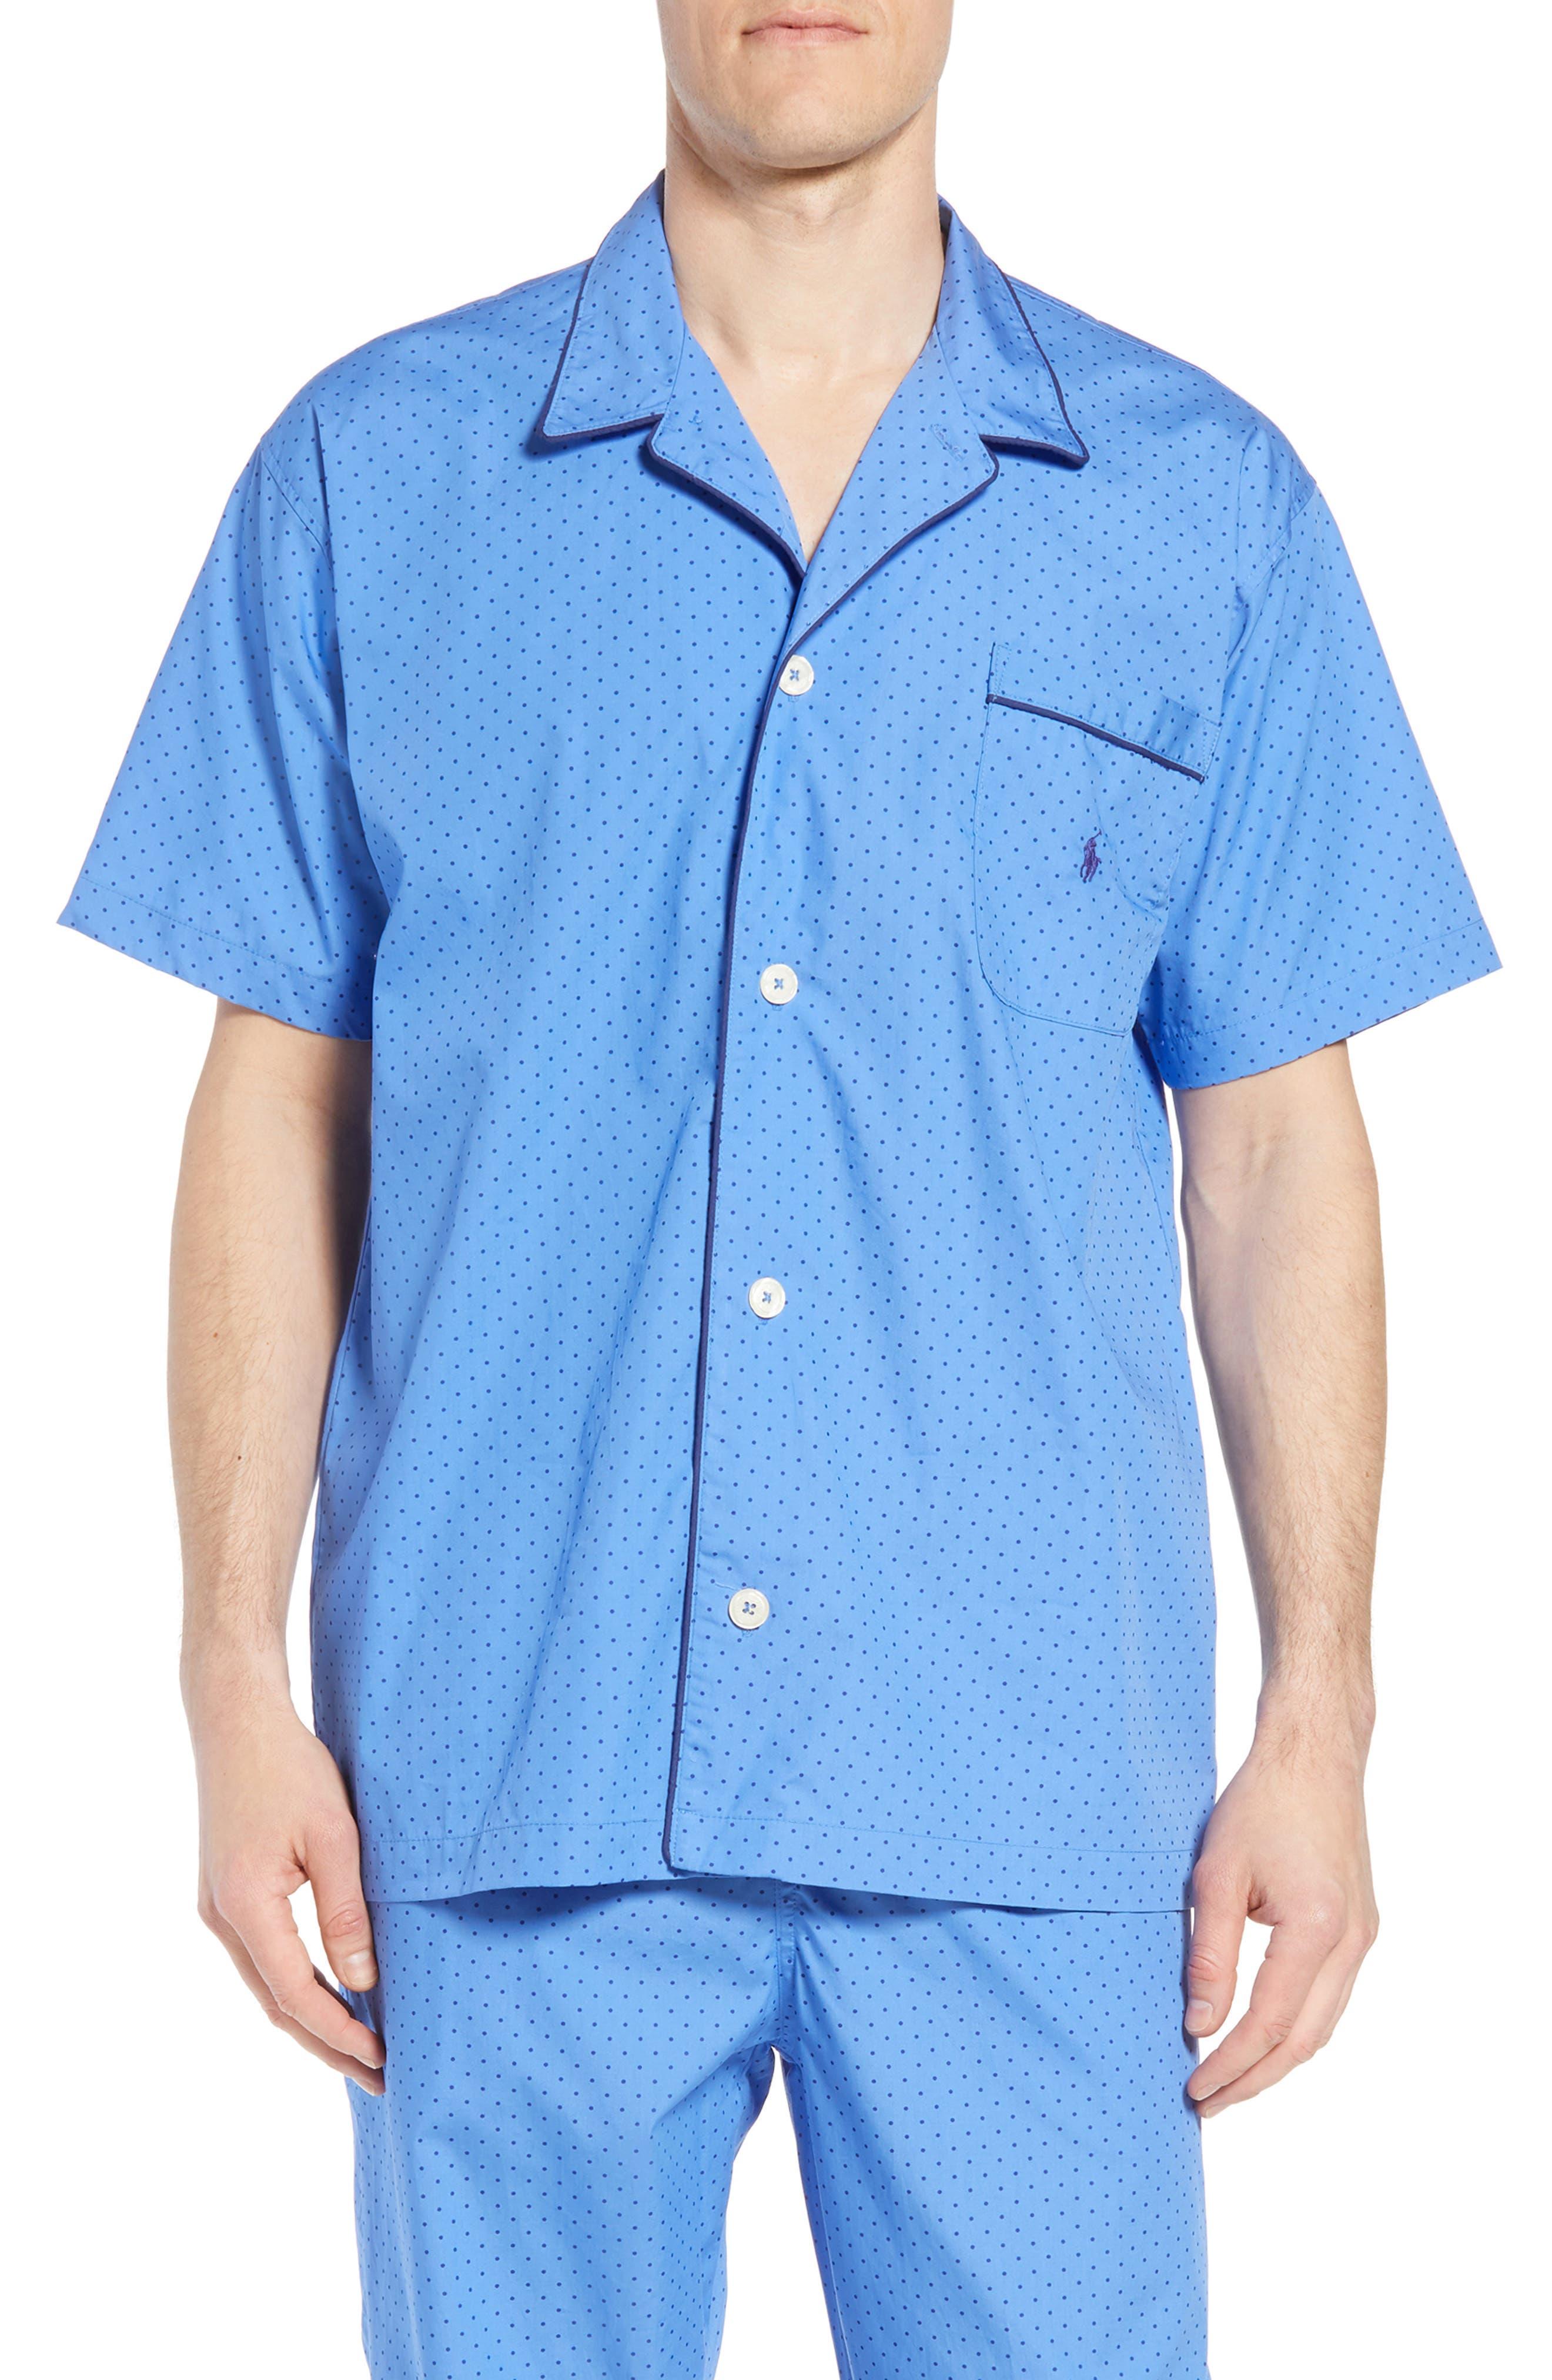 Dot Cotton Pajama Shirt,                             Main thumbnail 1, color,                             Harbour Island Blue/ Navy